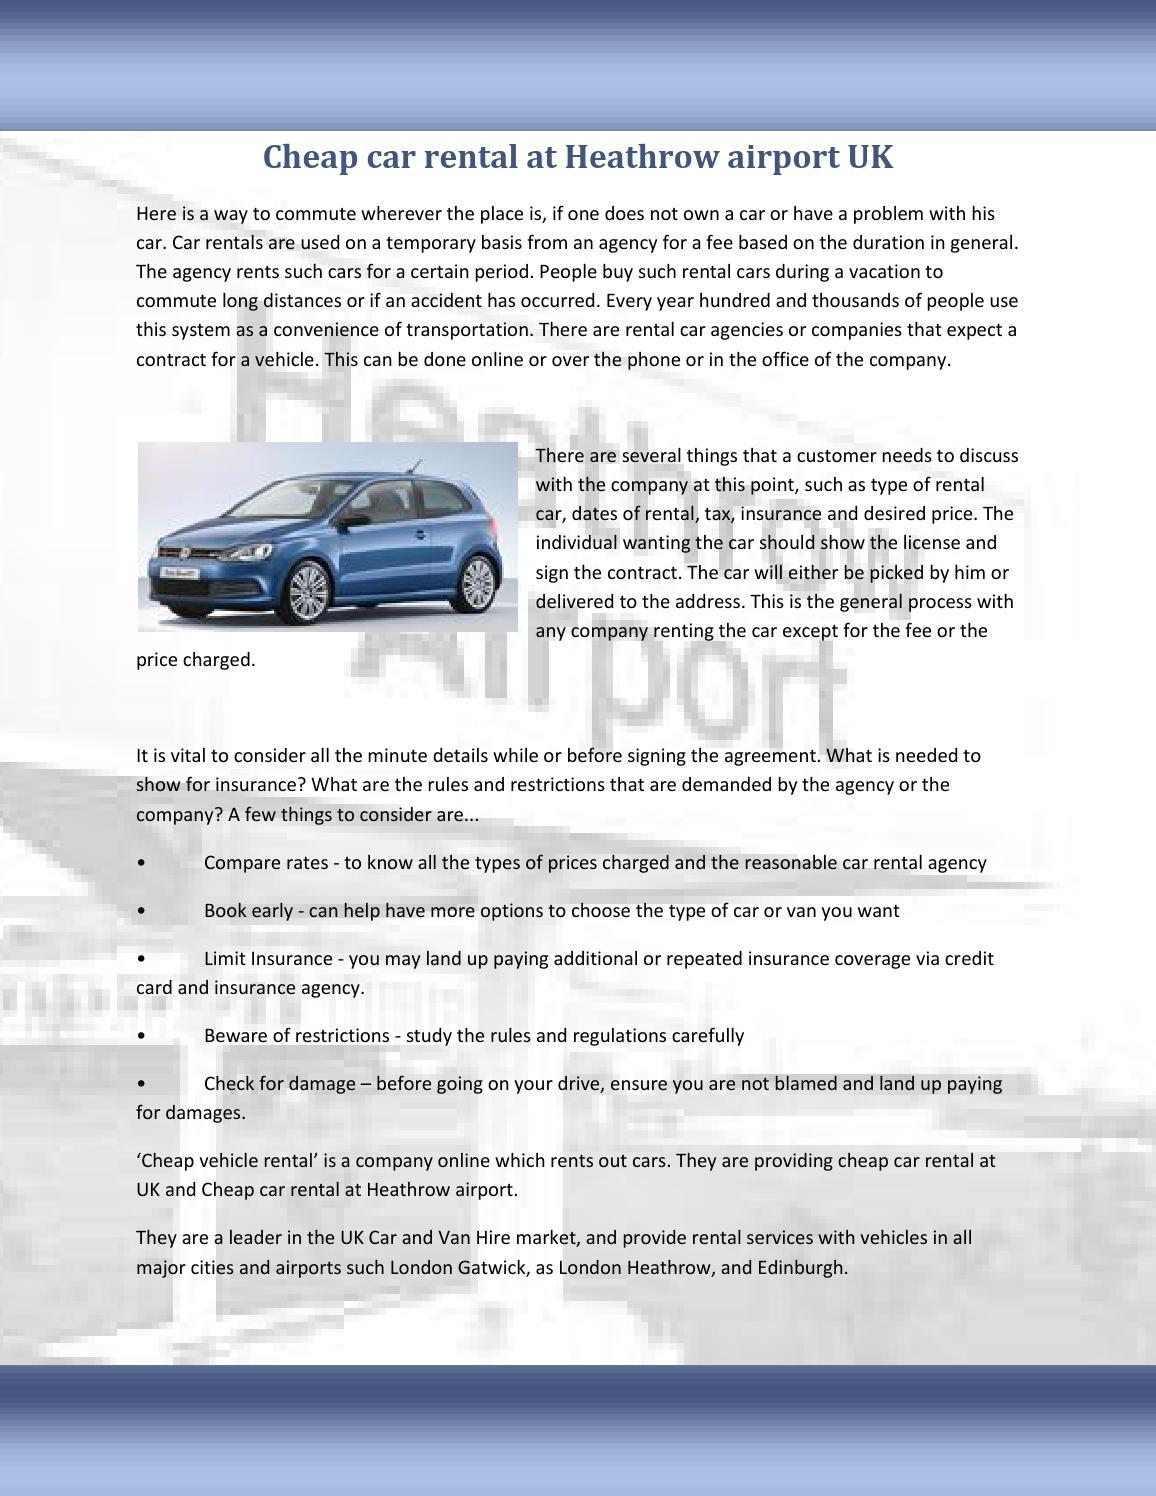 Cheap Car Rental At Heathrow Airport London Uk By Cheap Vehicle